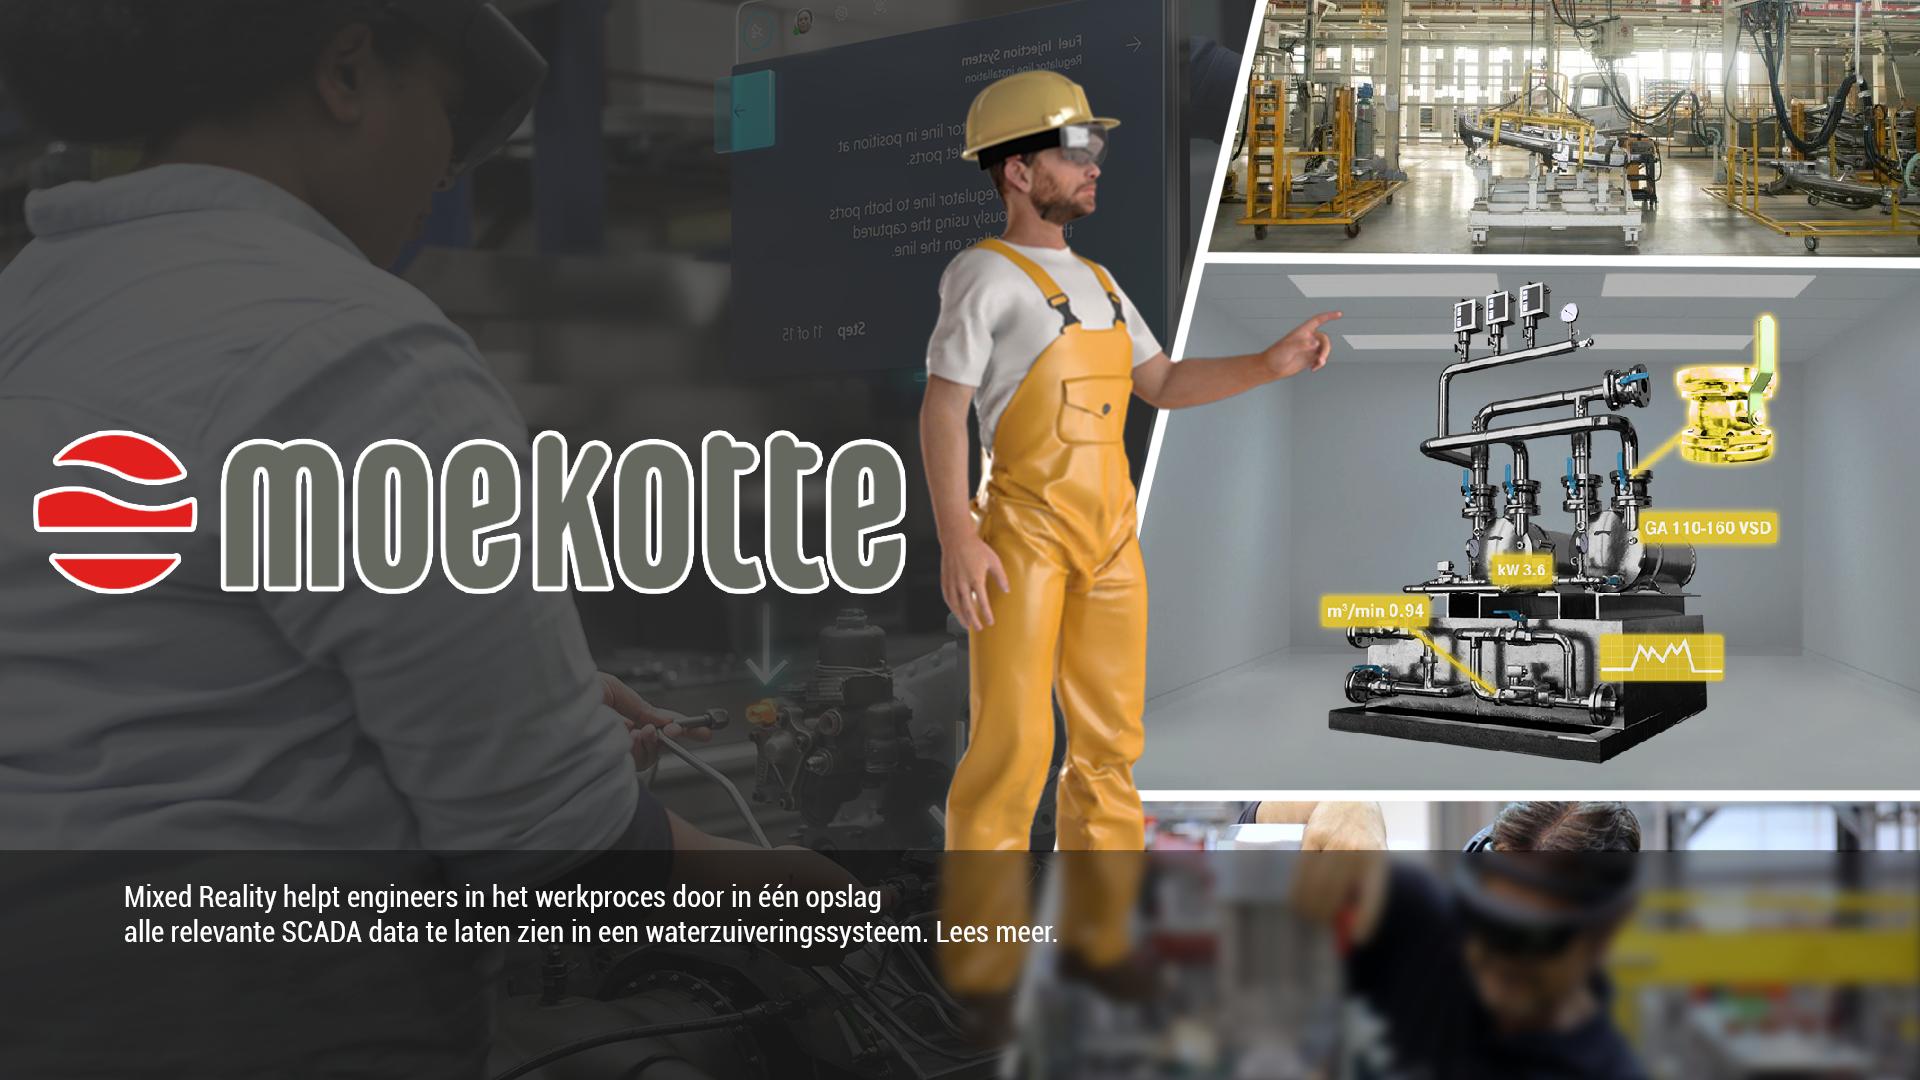 augmented- en mixed reality campagnes (moekotte balk)